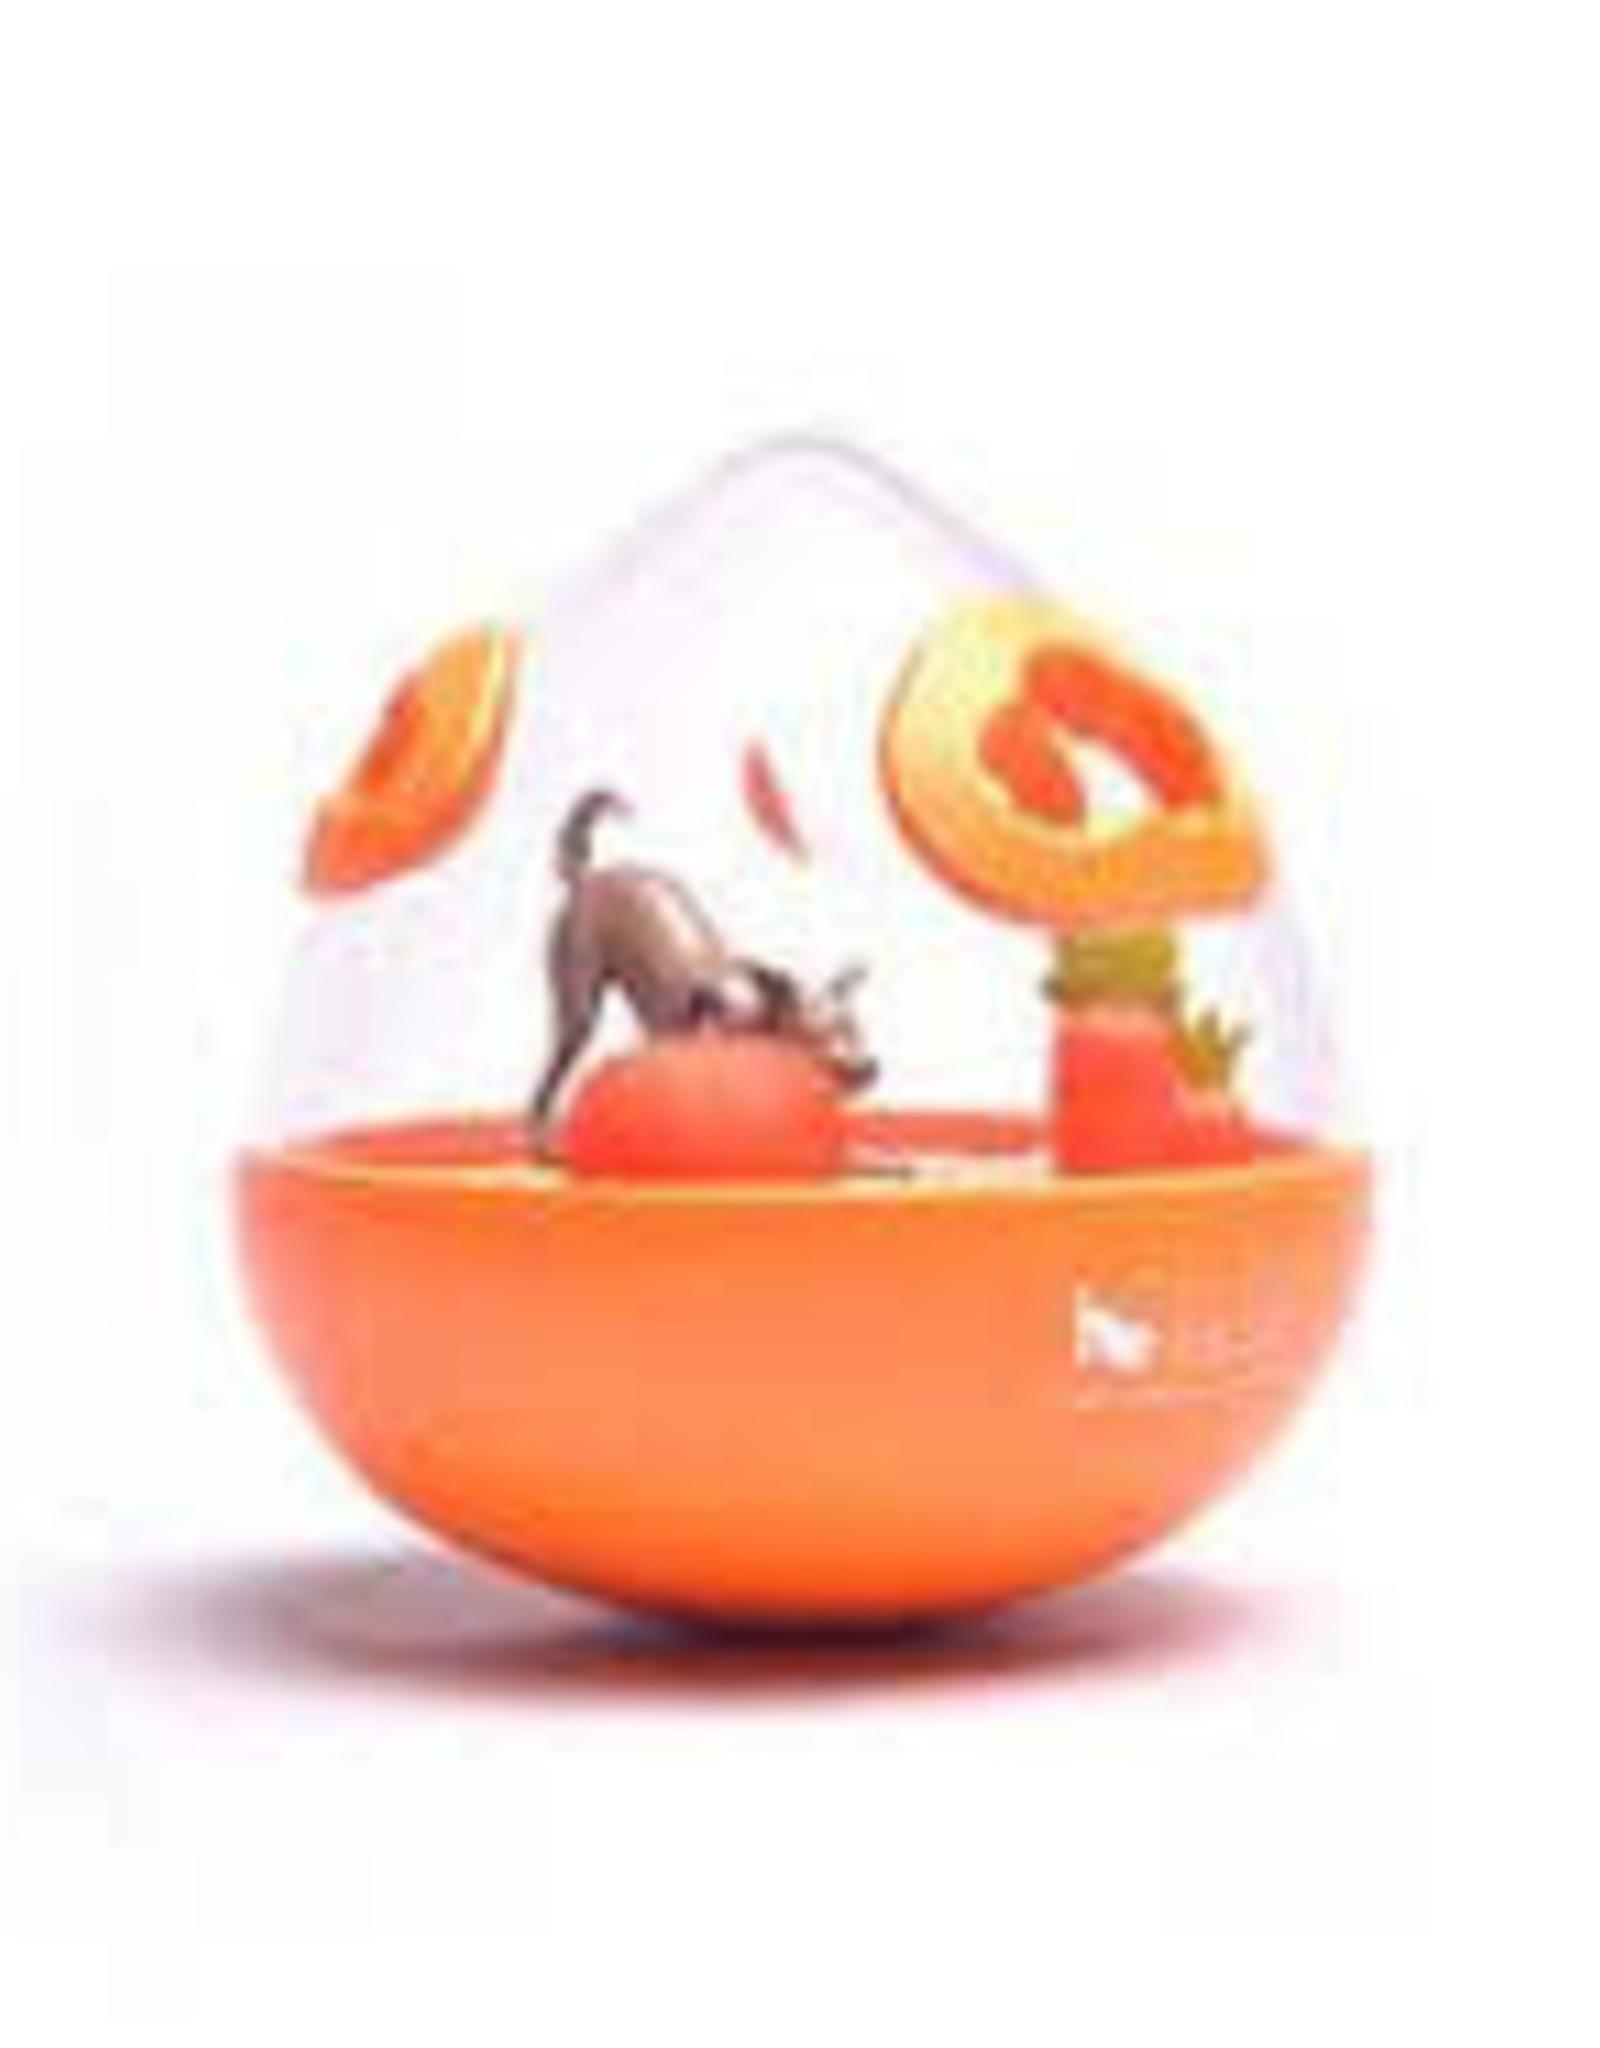 Pet Play Pet Play Wobble Ball 2.0 Enrichment Treat Toy Orange